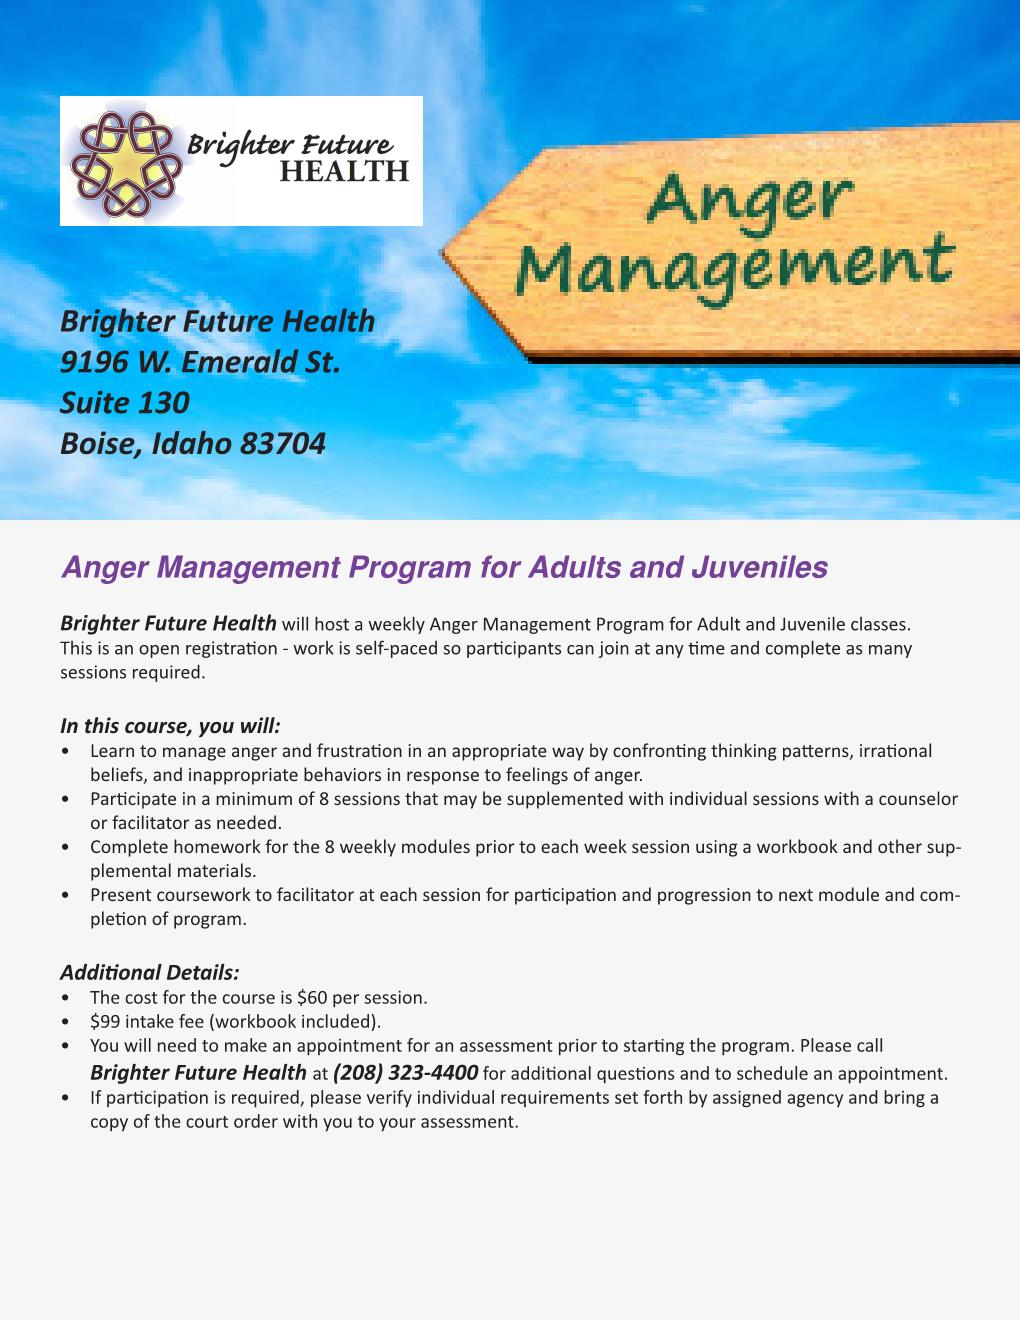 Adult anger management classes